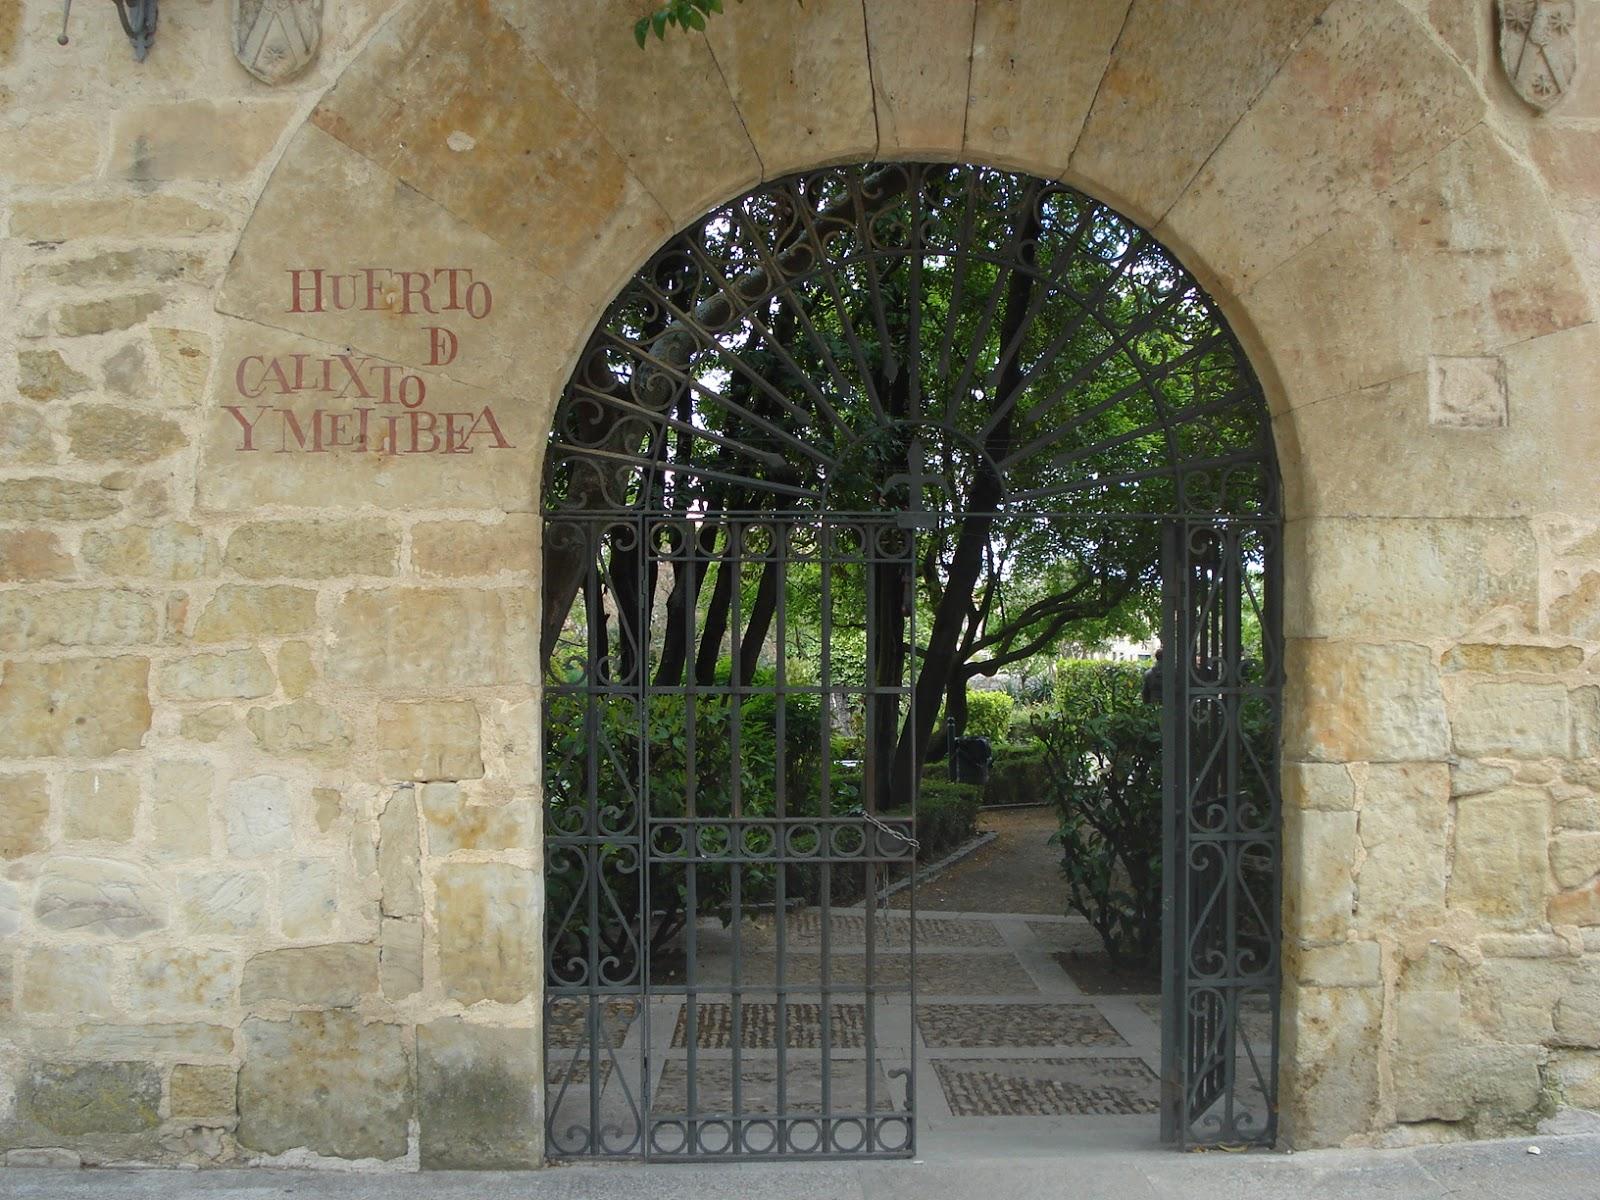 The legend of the garden of calixto y melibea spanish in spain t a tula spanish school in - Jardin de calisto y melibea salamanca ...